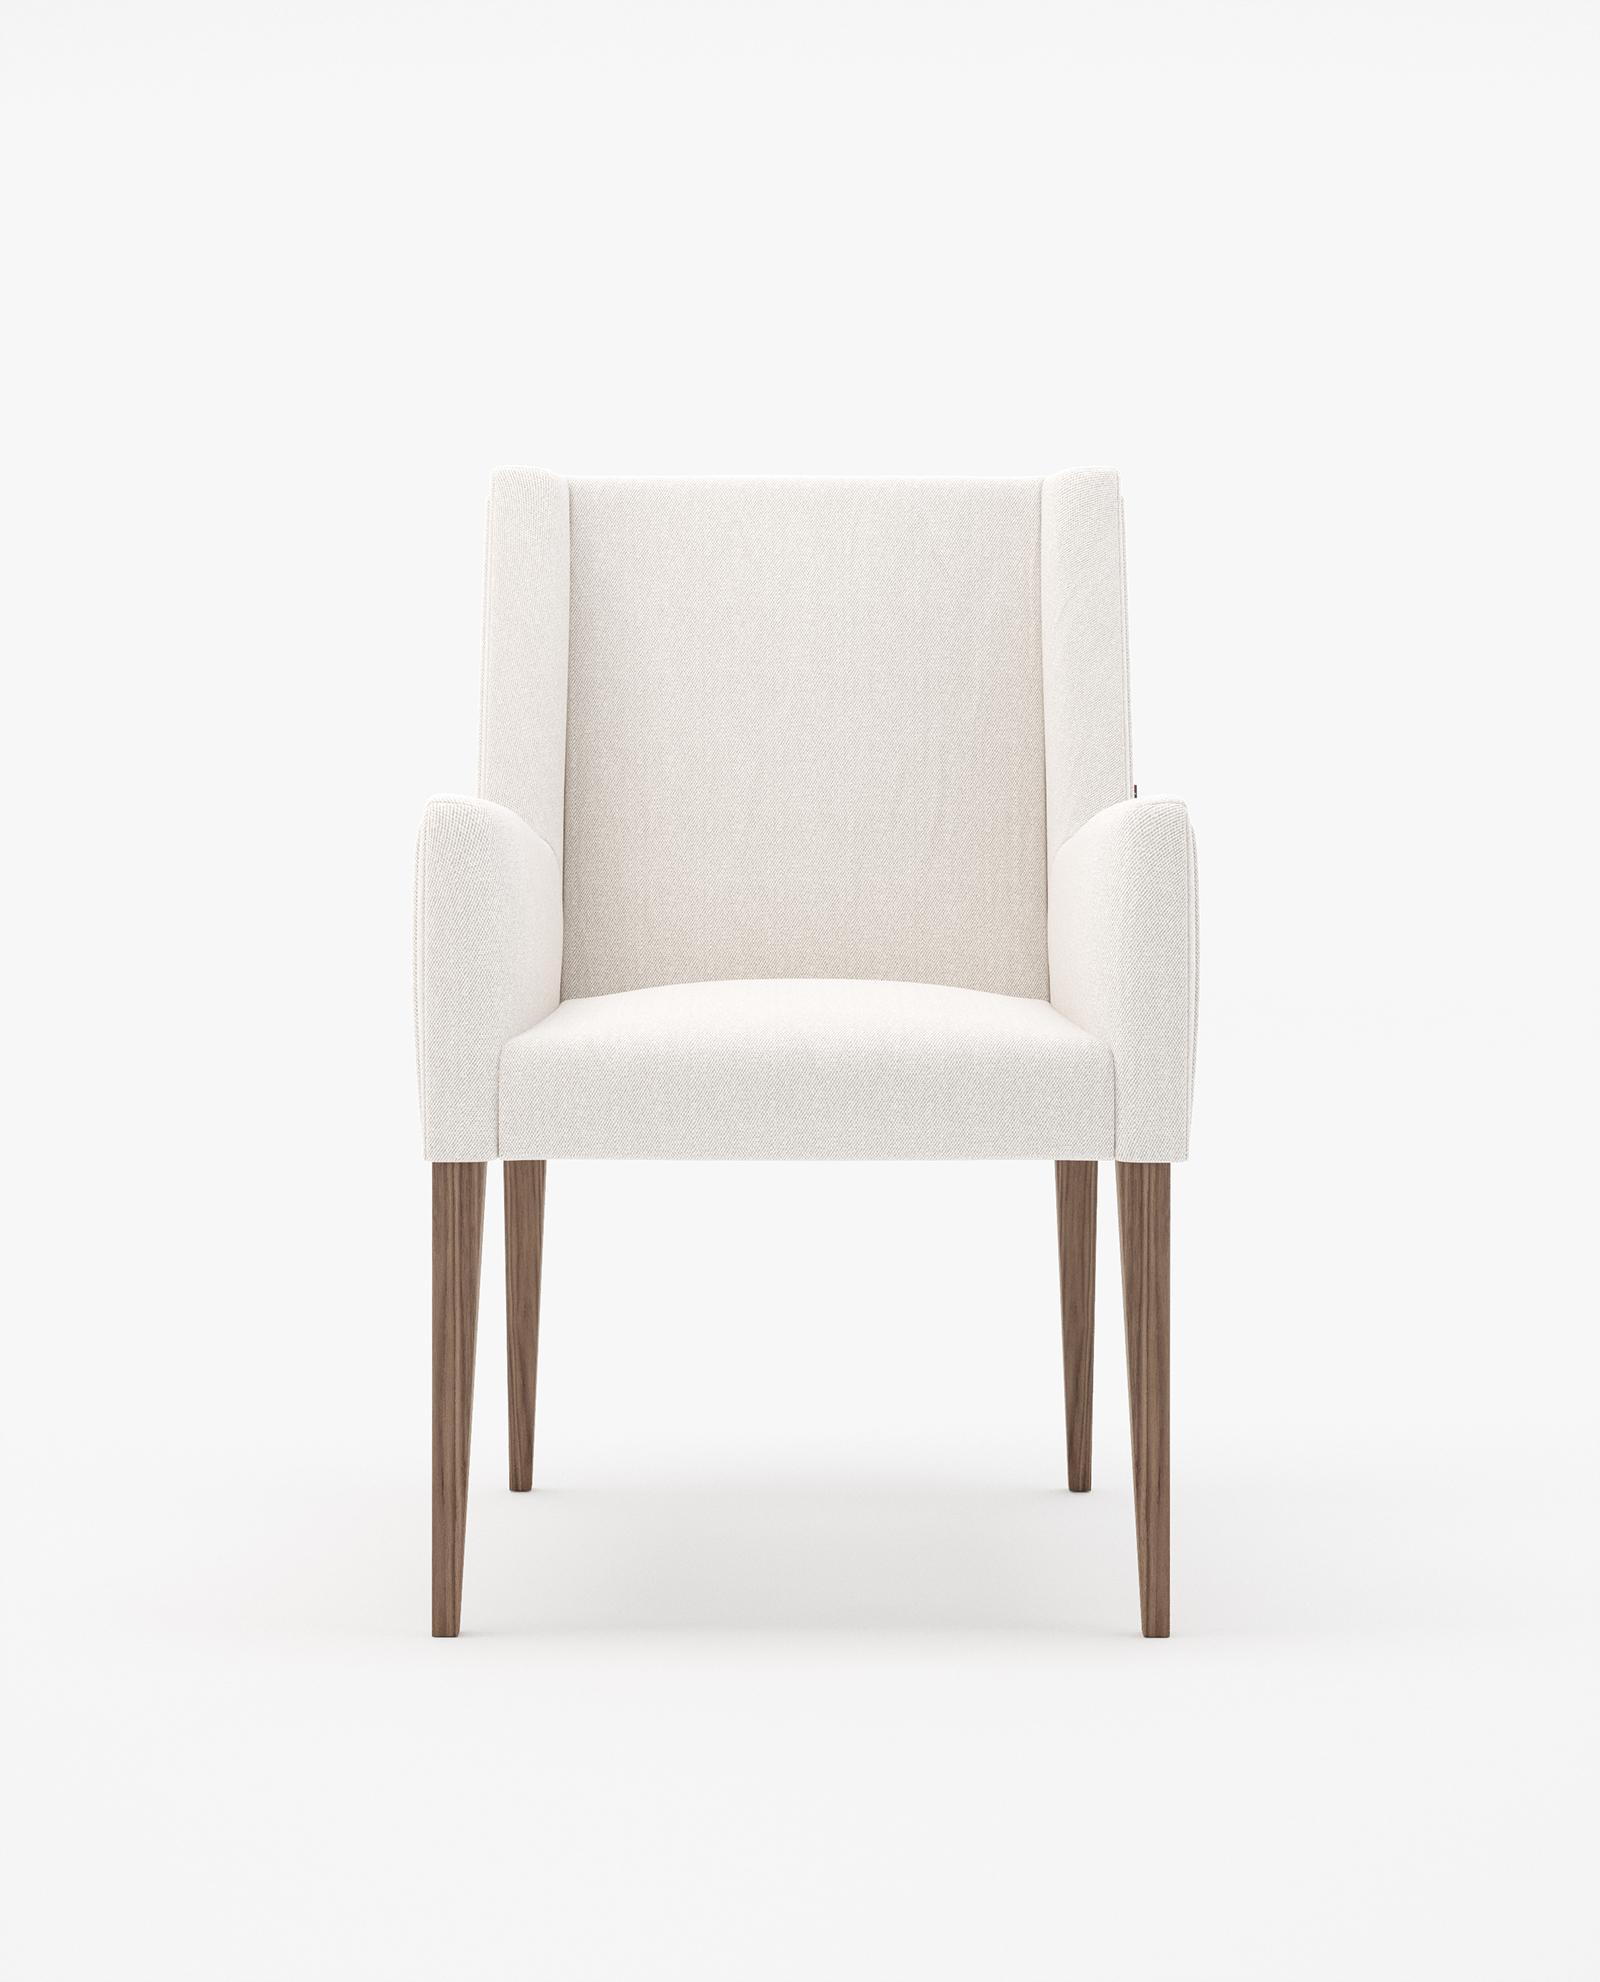 cadeira-bracos-perola-nogueira (2)